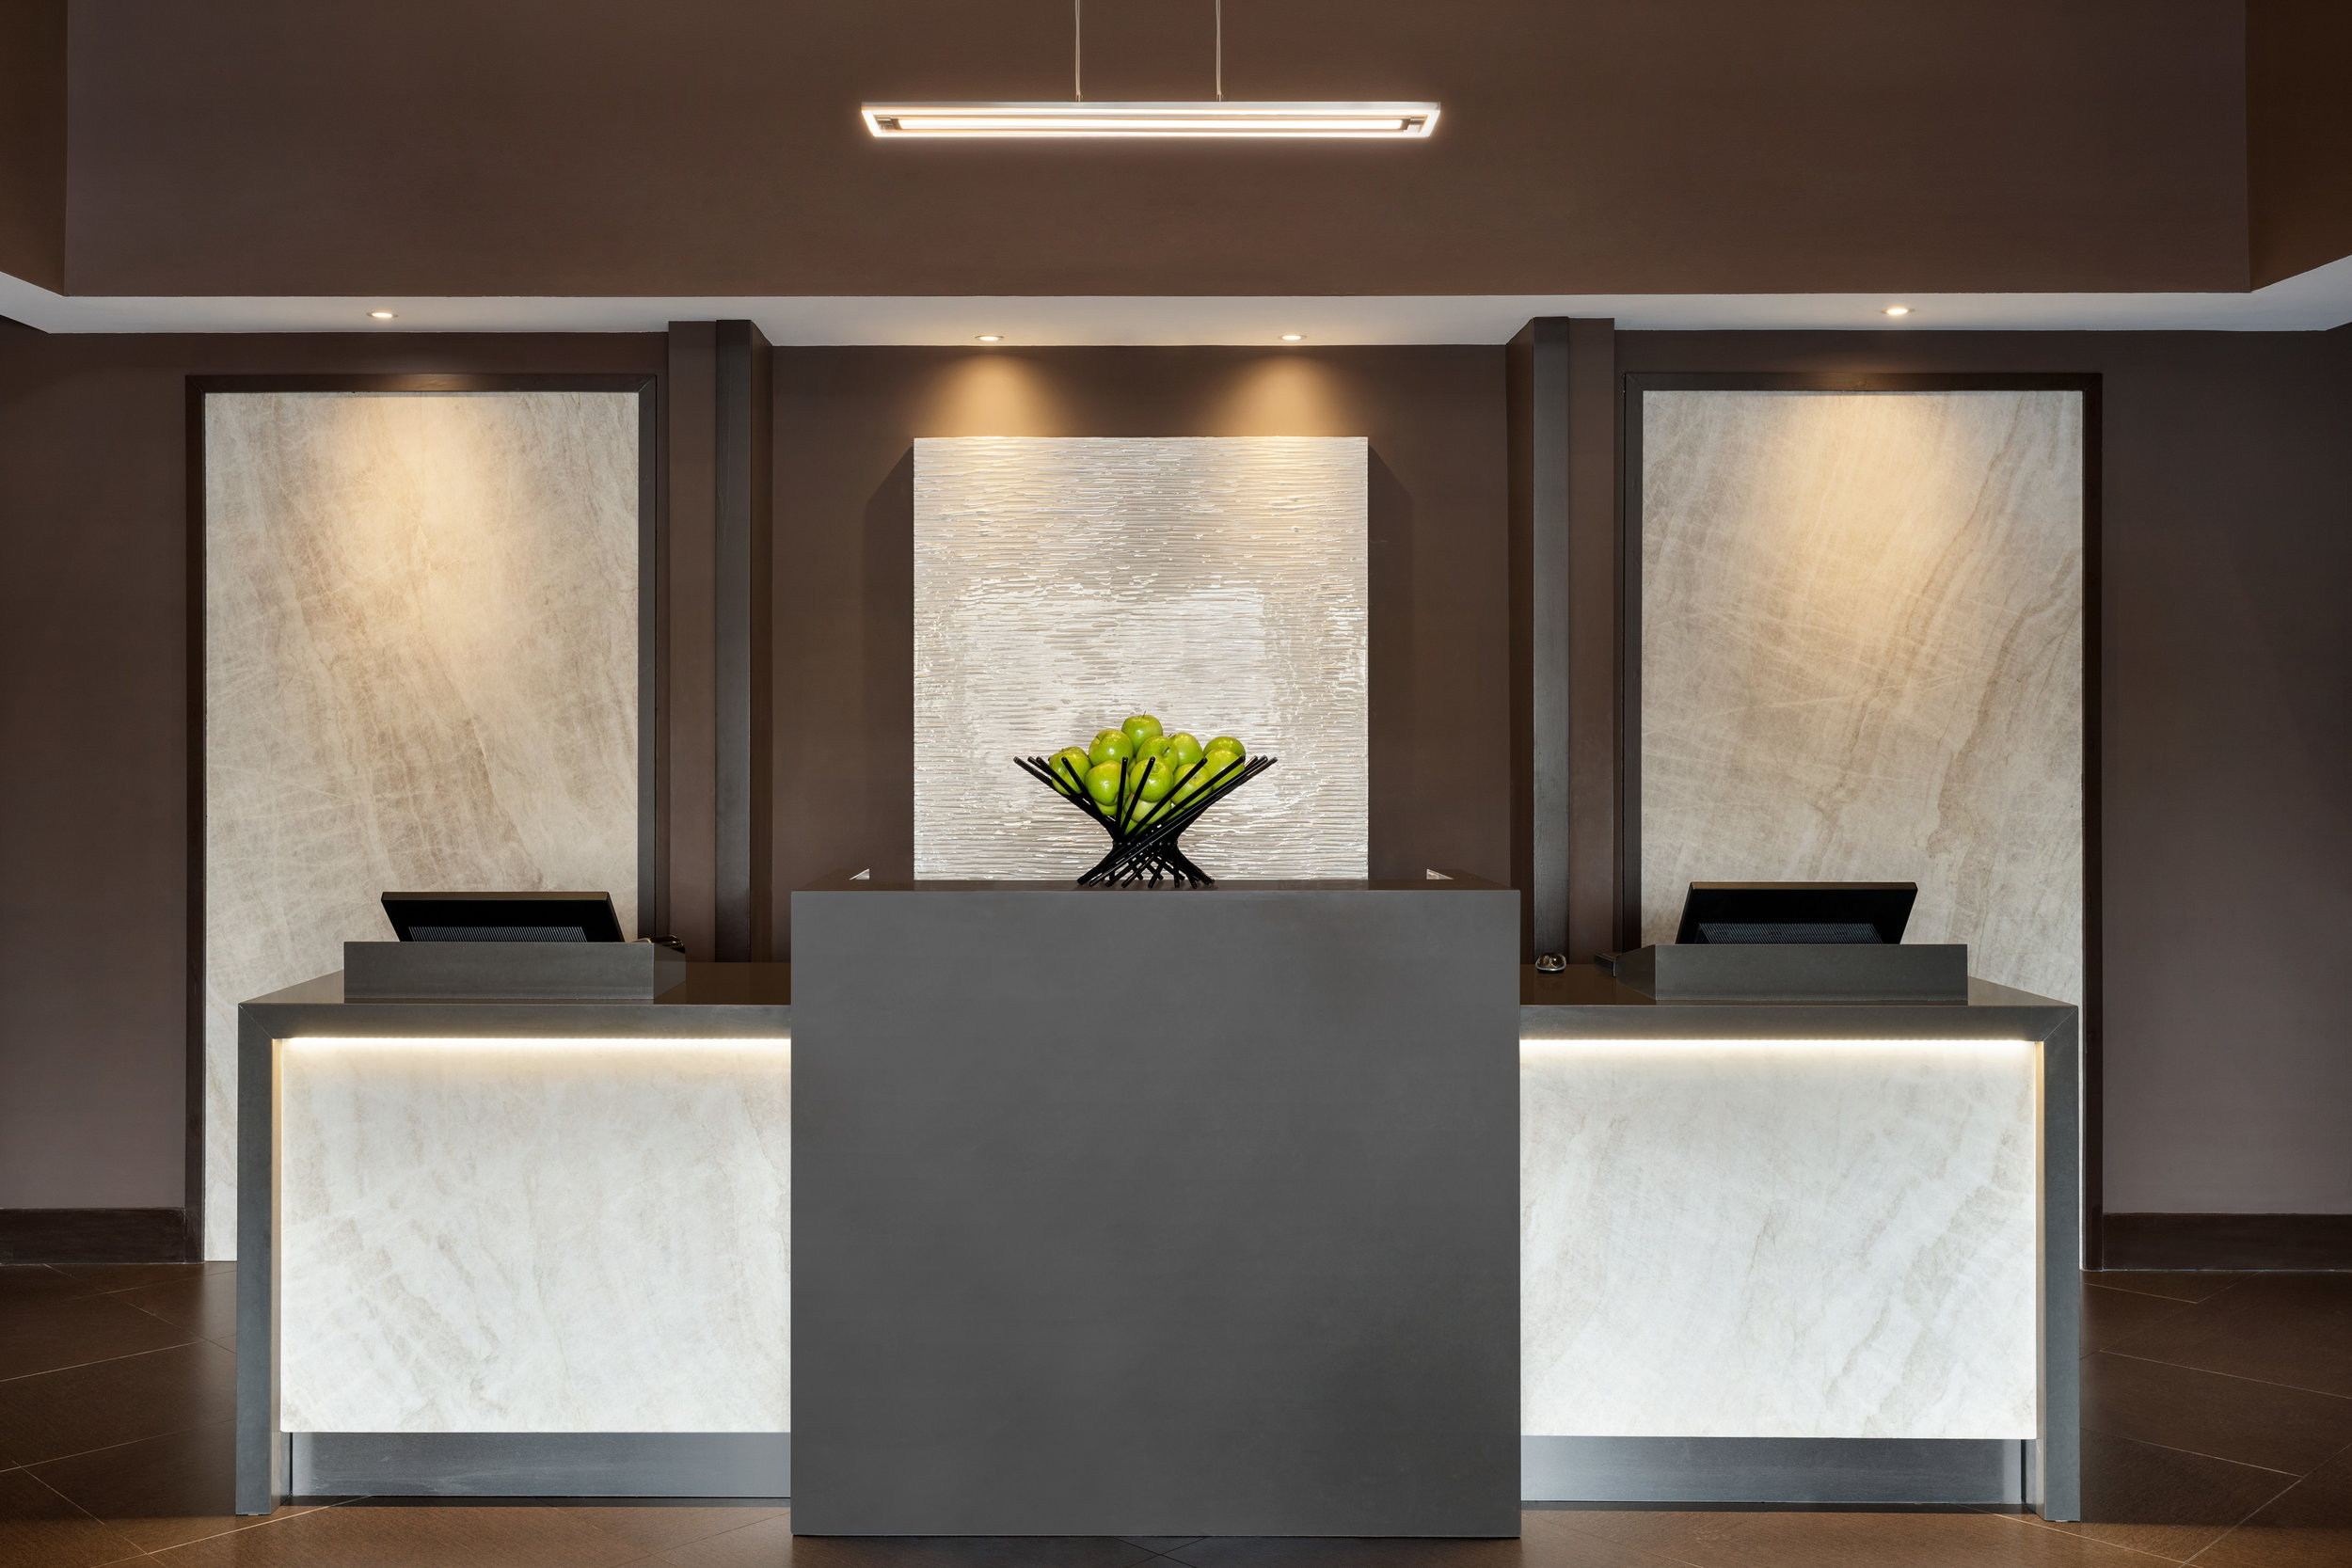 Hyatt-Place-Philadelphia-King-of-Prussia-Front-Desk-01.jpg